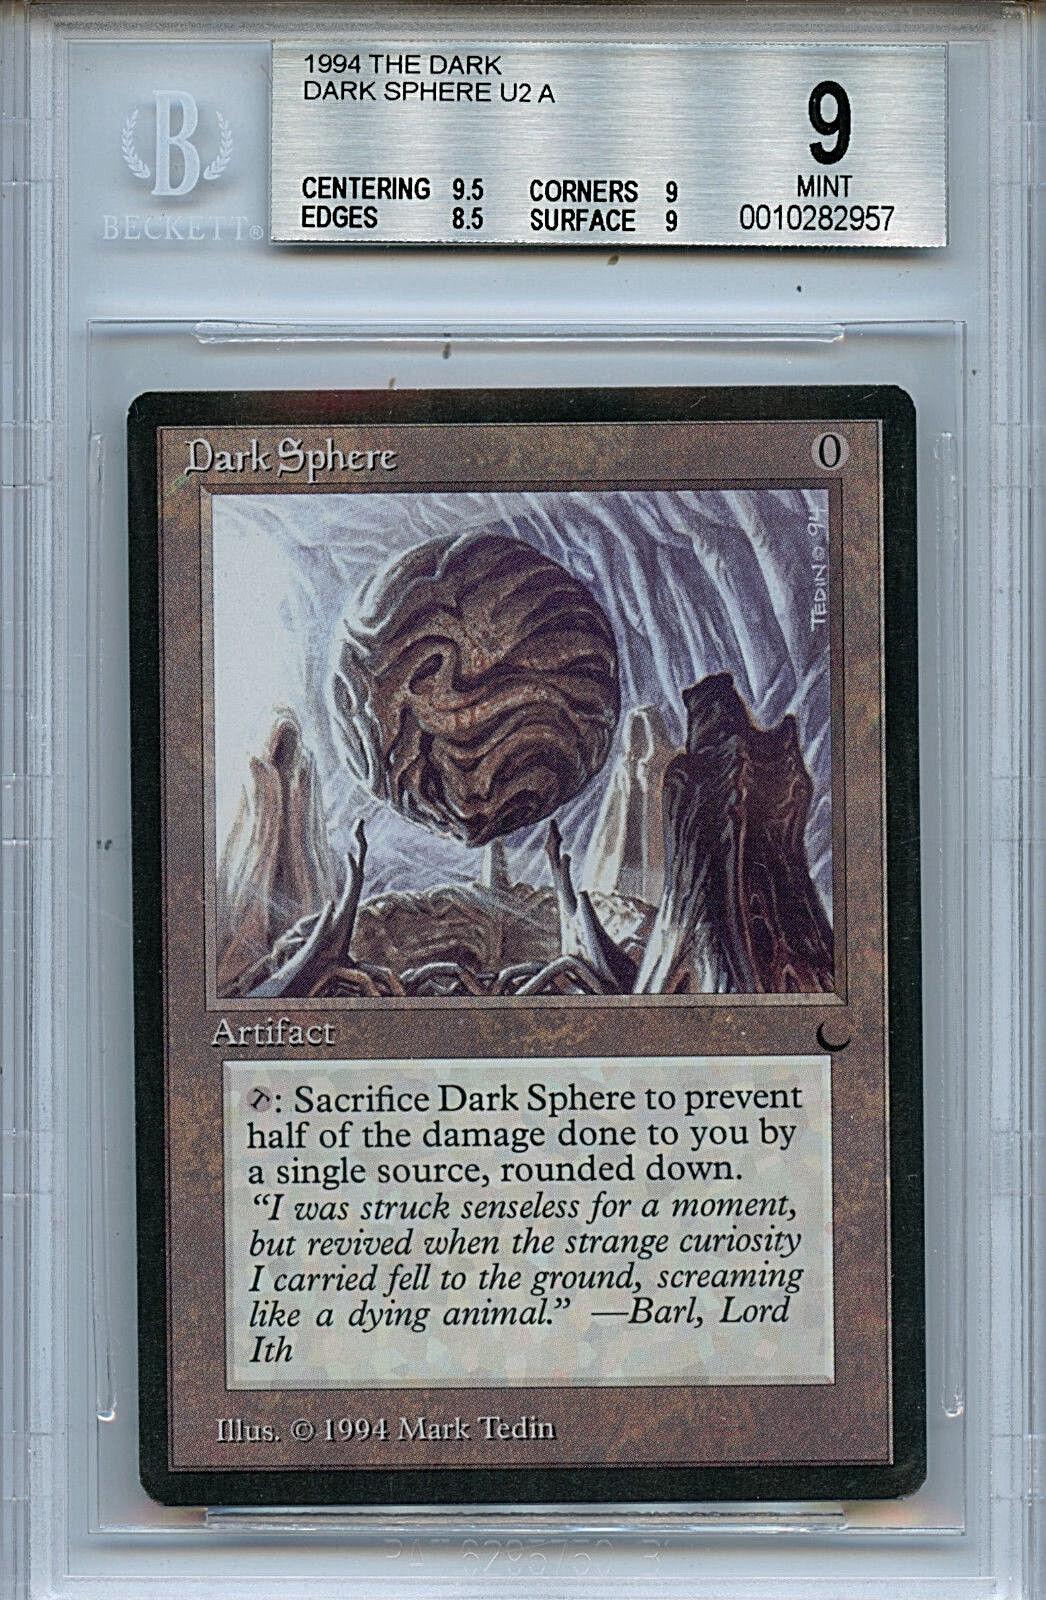 MTG Dark Dark Dark Dark Sphere BGS 9.0 (9) Mint card Magic the Gathering WOTC 2957 ca2212